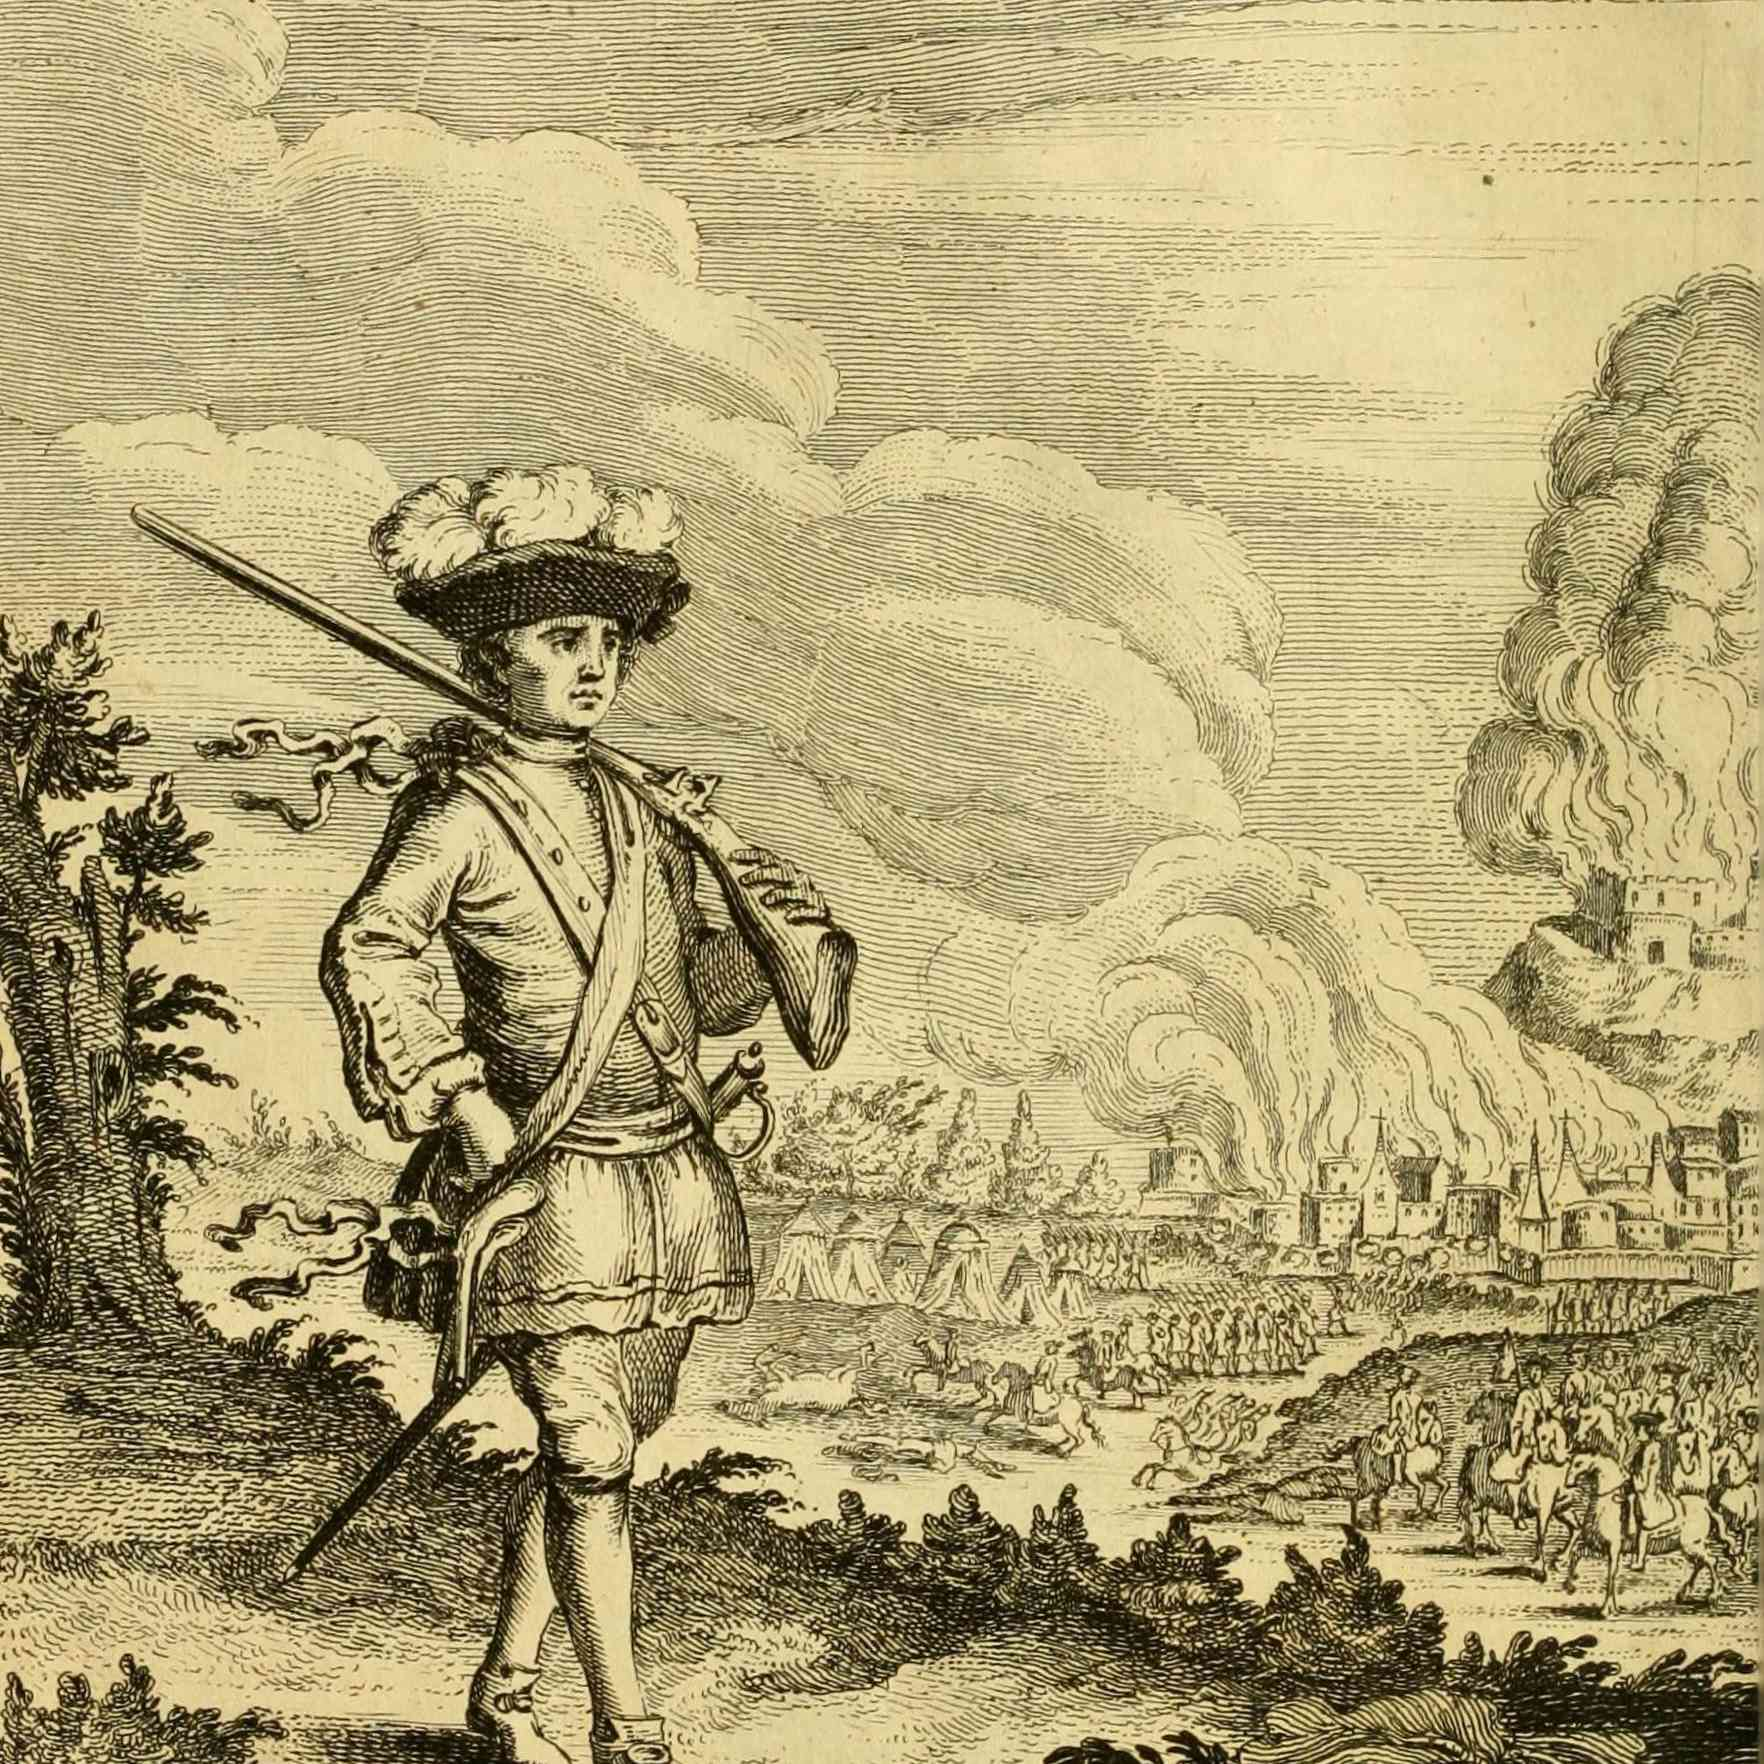 Captain Henry Morgan before Panama, 1671